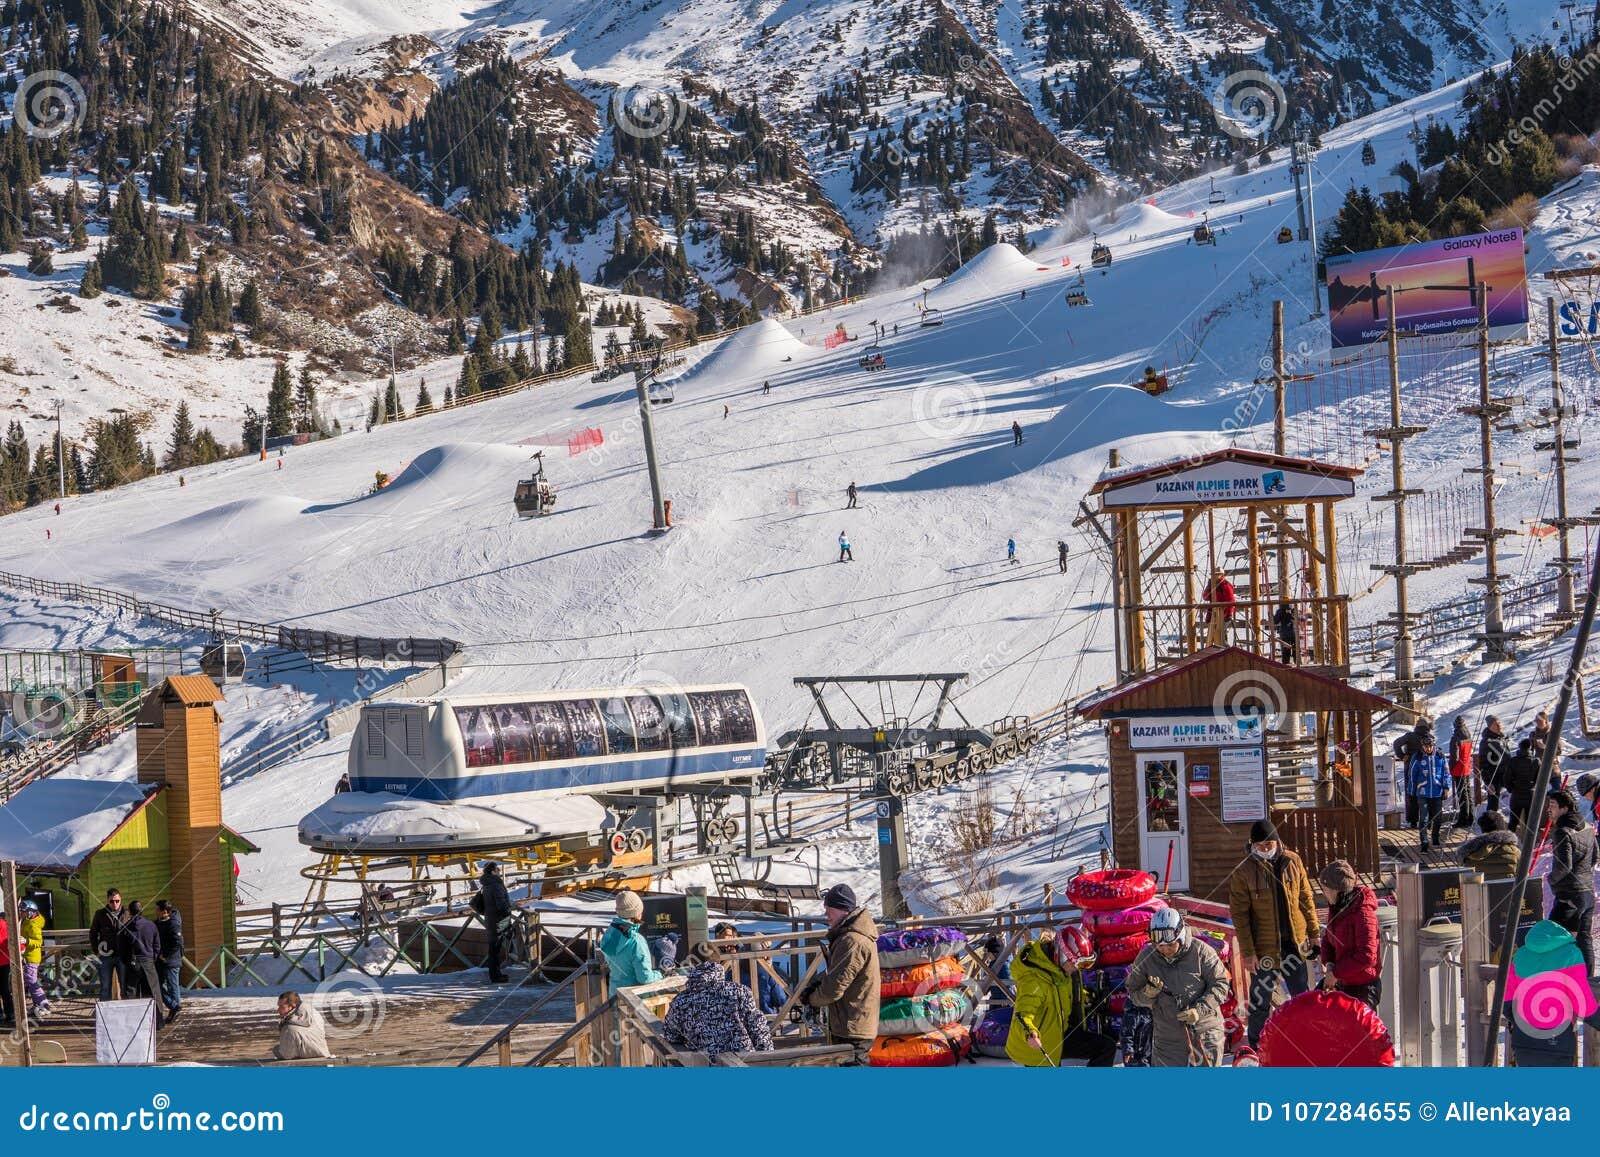 almaty, kazakhstan 18 december 2018: shymbulak ski resort near a